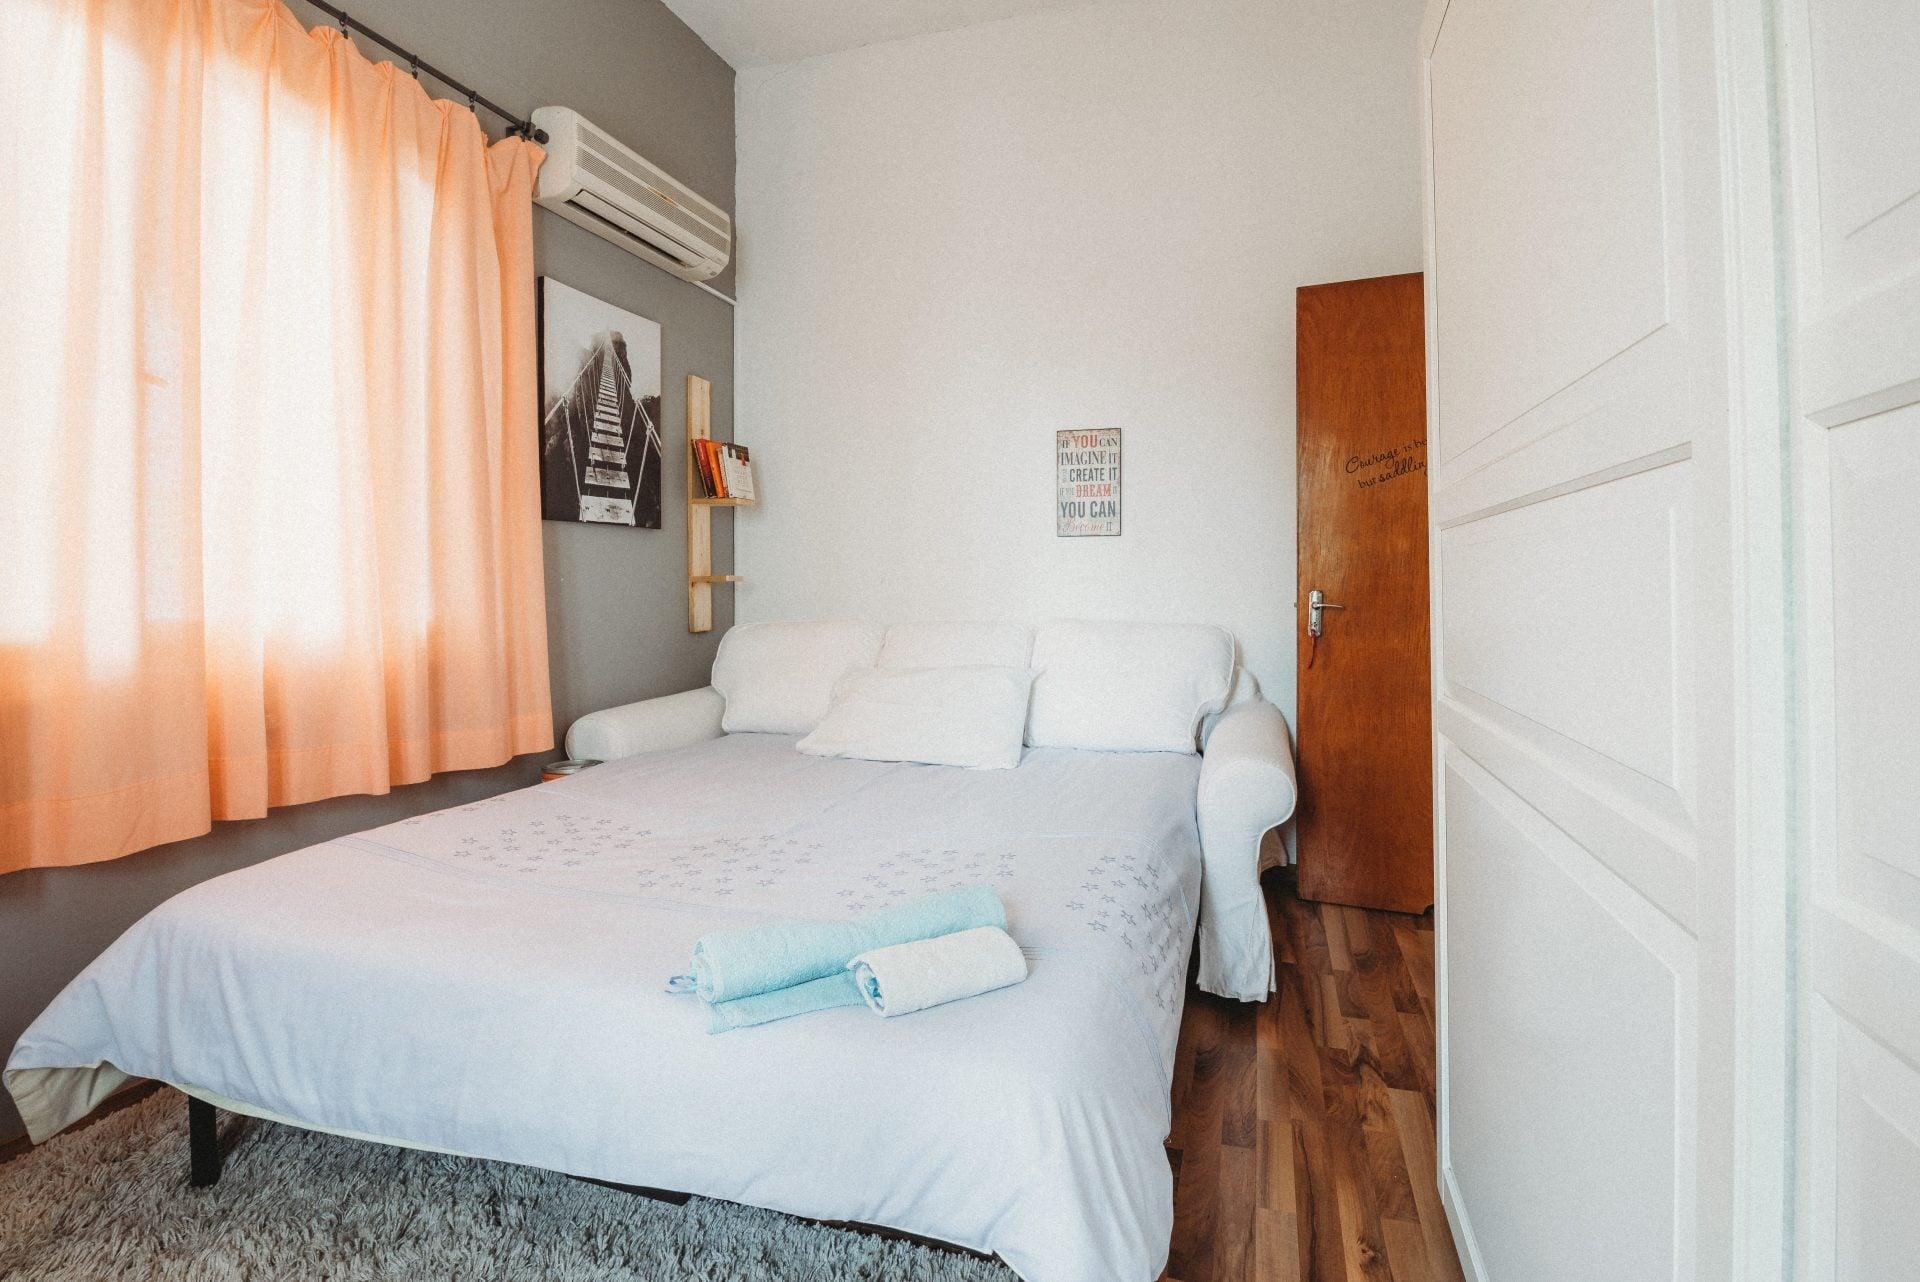 filios sazeides exlKkVa bvs unsplash 1920x1282 - Shopping tips when buying a new mattress